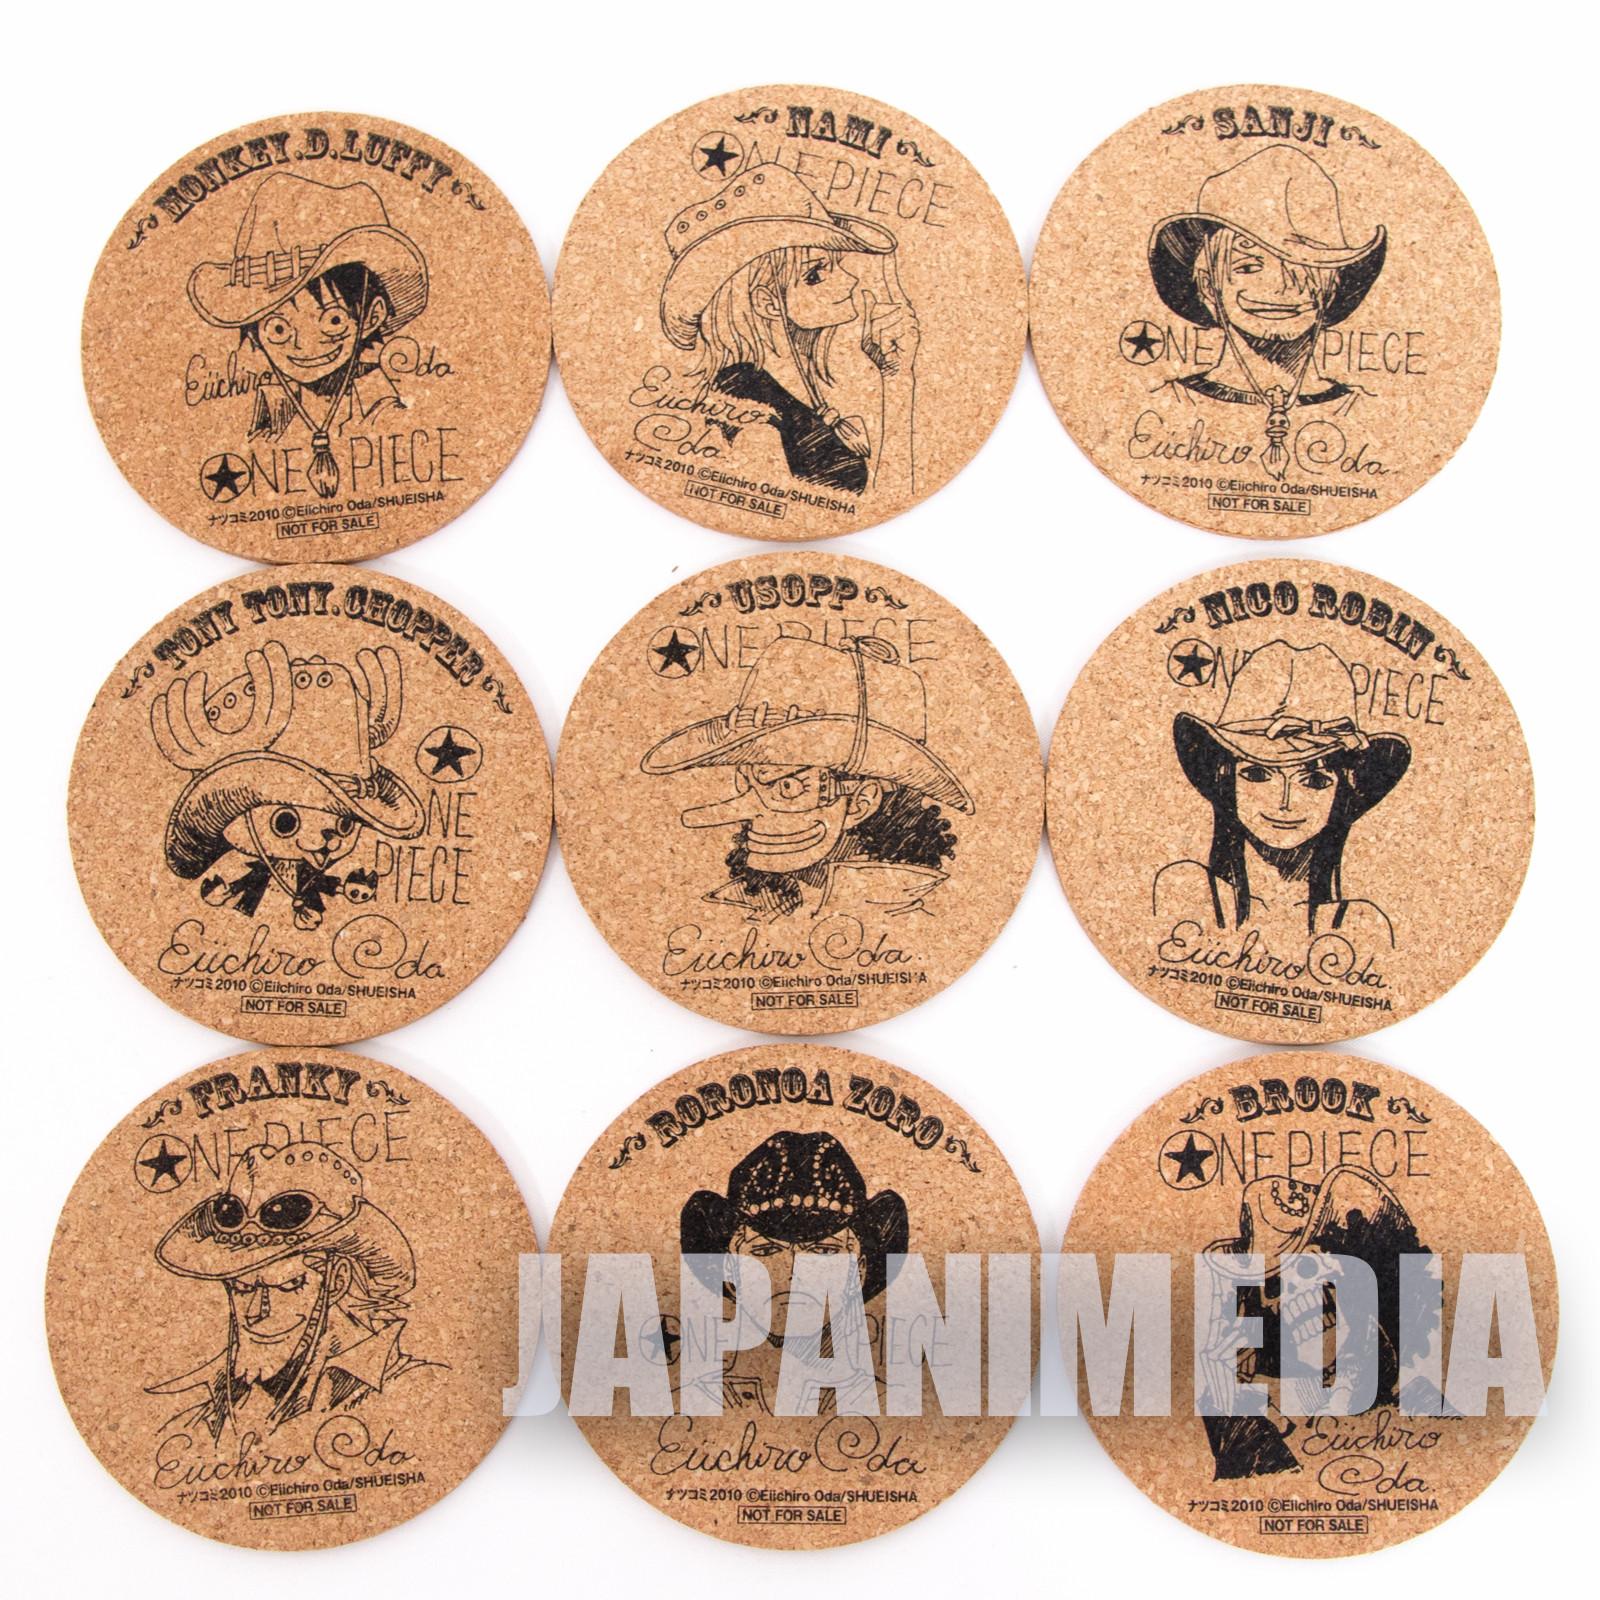 ONE PIECE Cork Coaster 9pc Set JAPAN ANIME